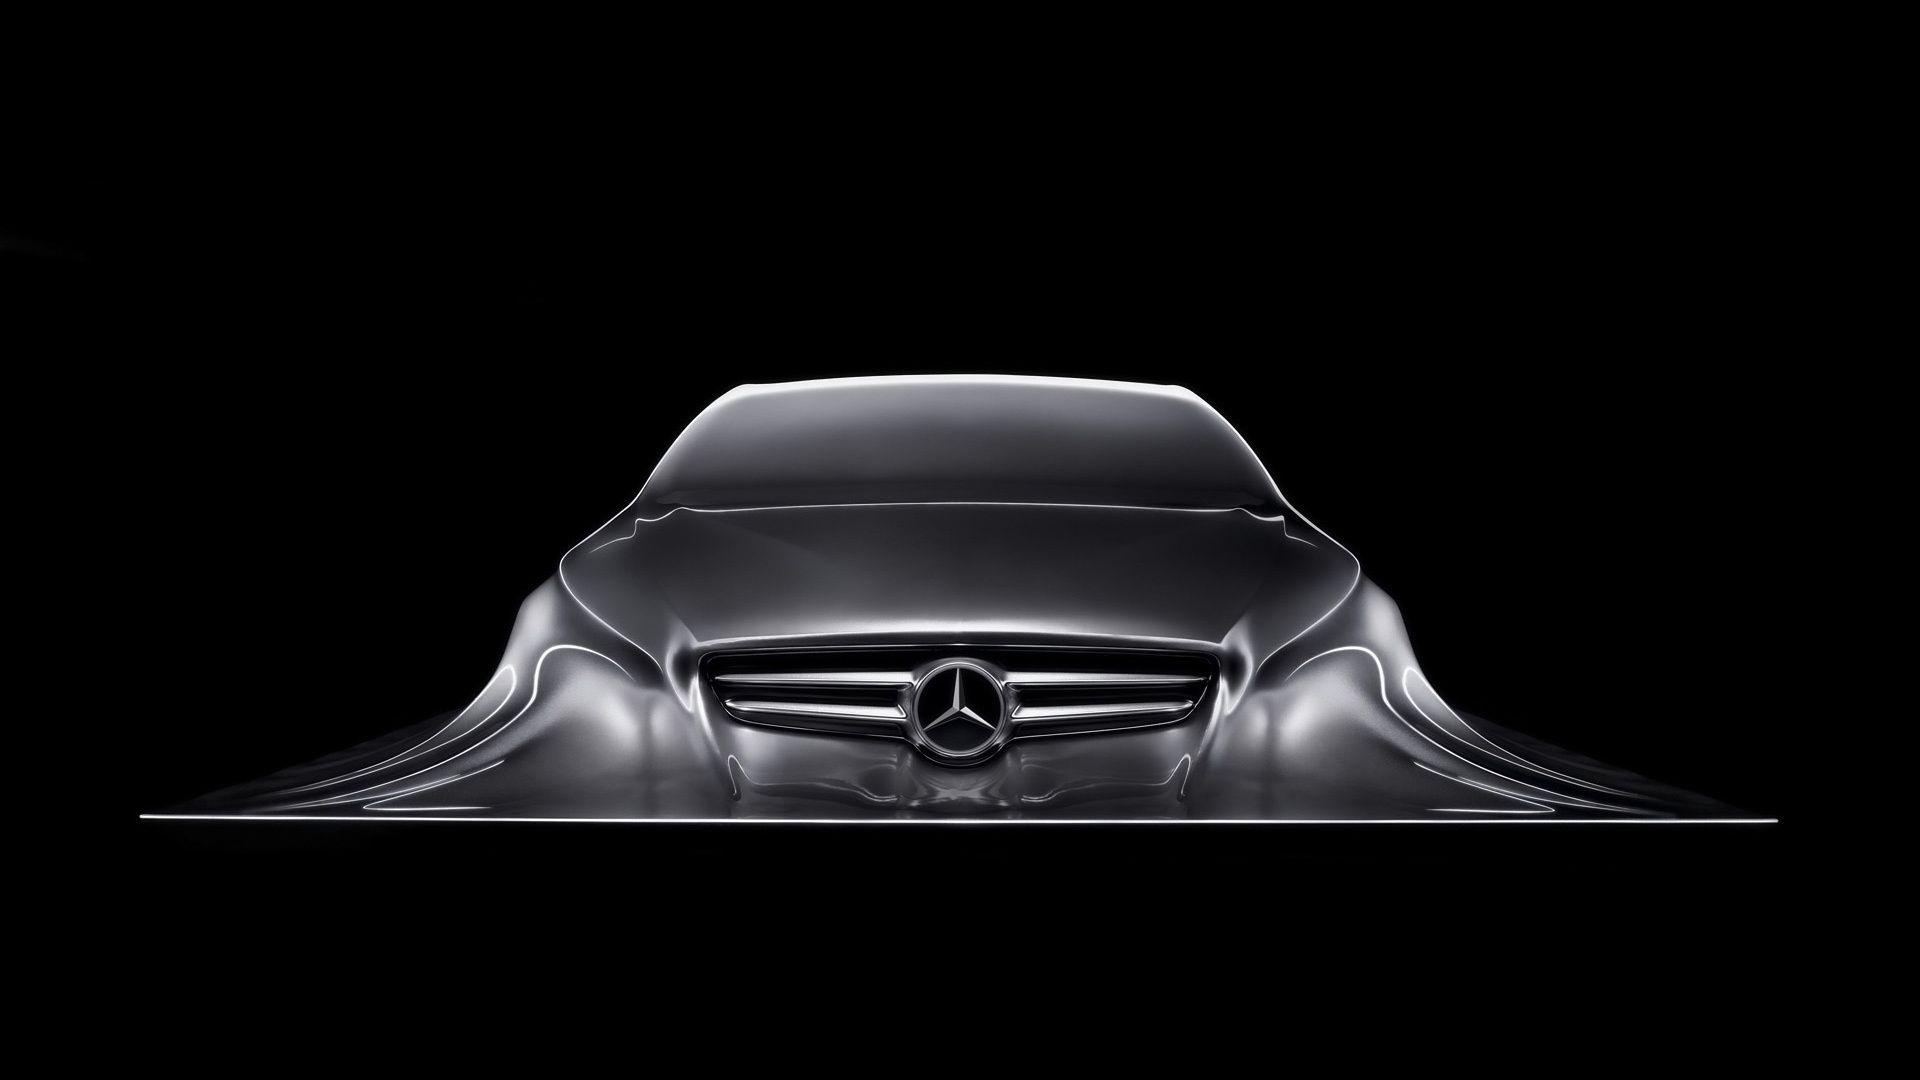 Mercedez Benz Good Logo Hd Wallpaper Mercedes Benz Wallpaper